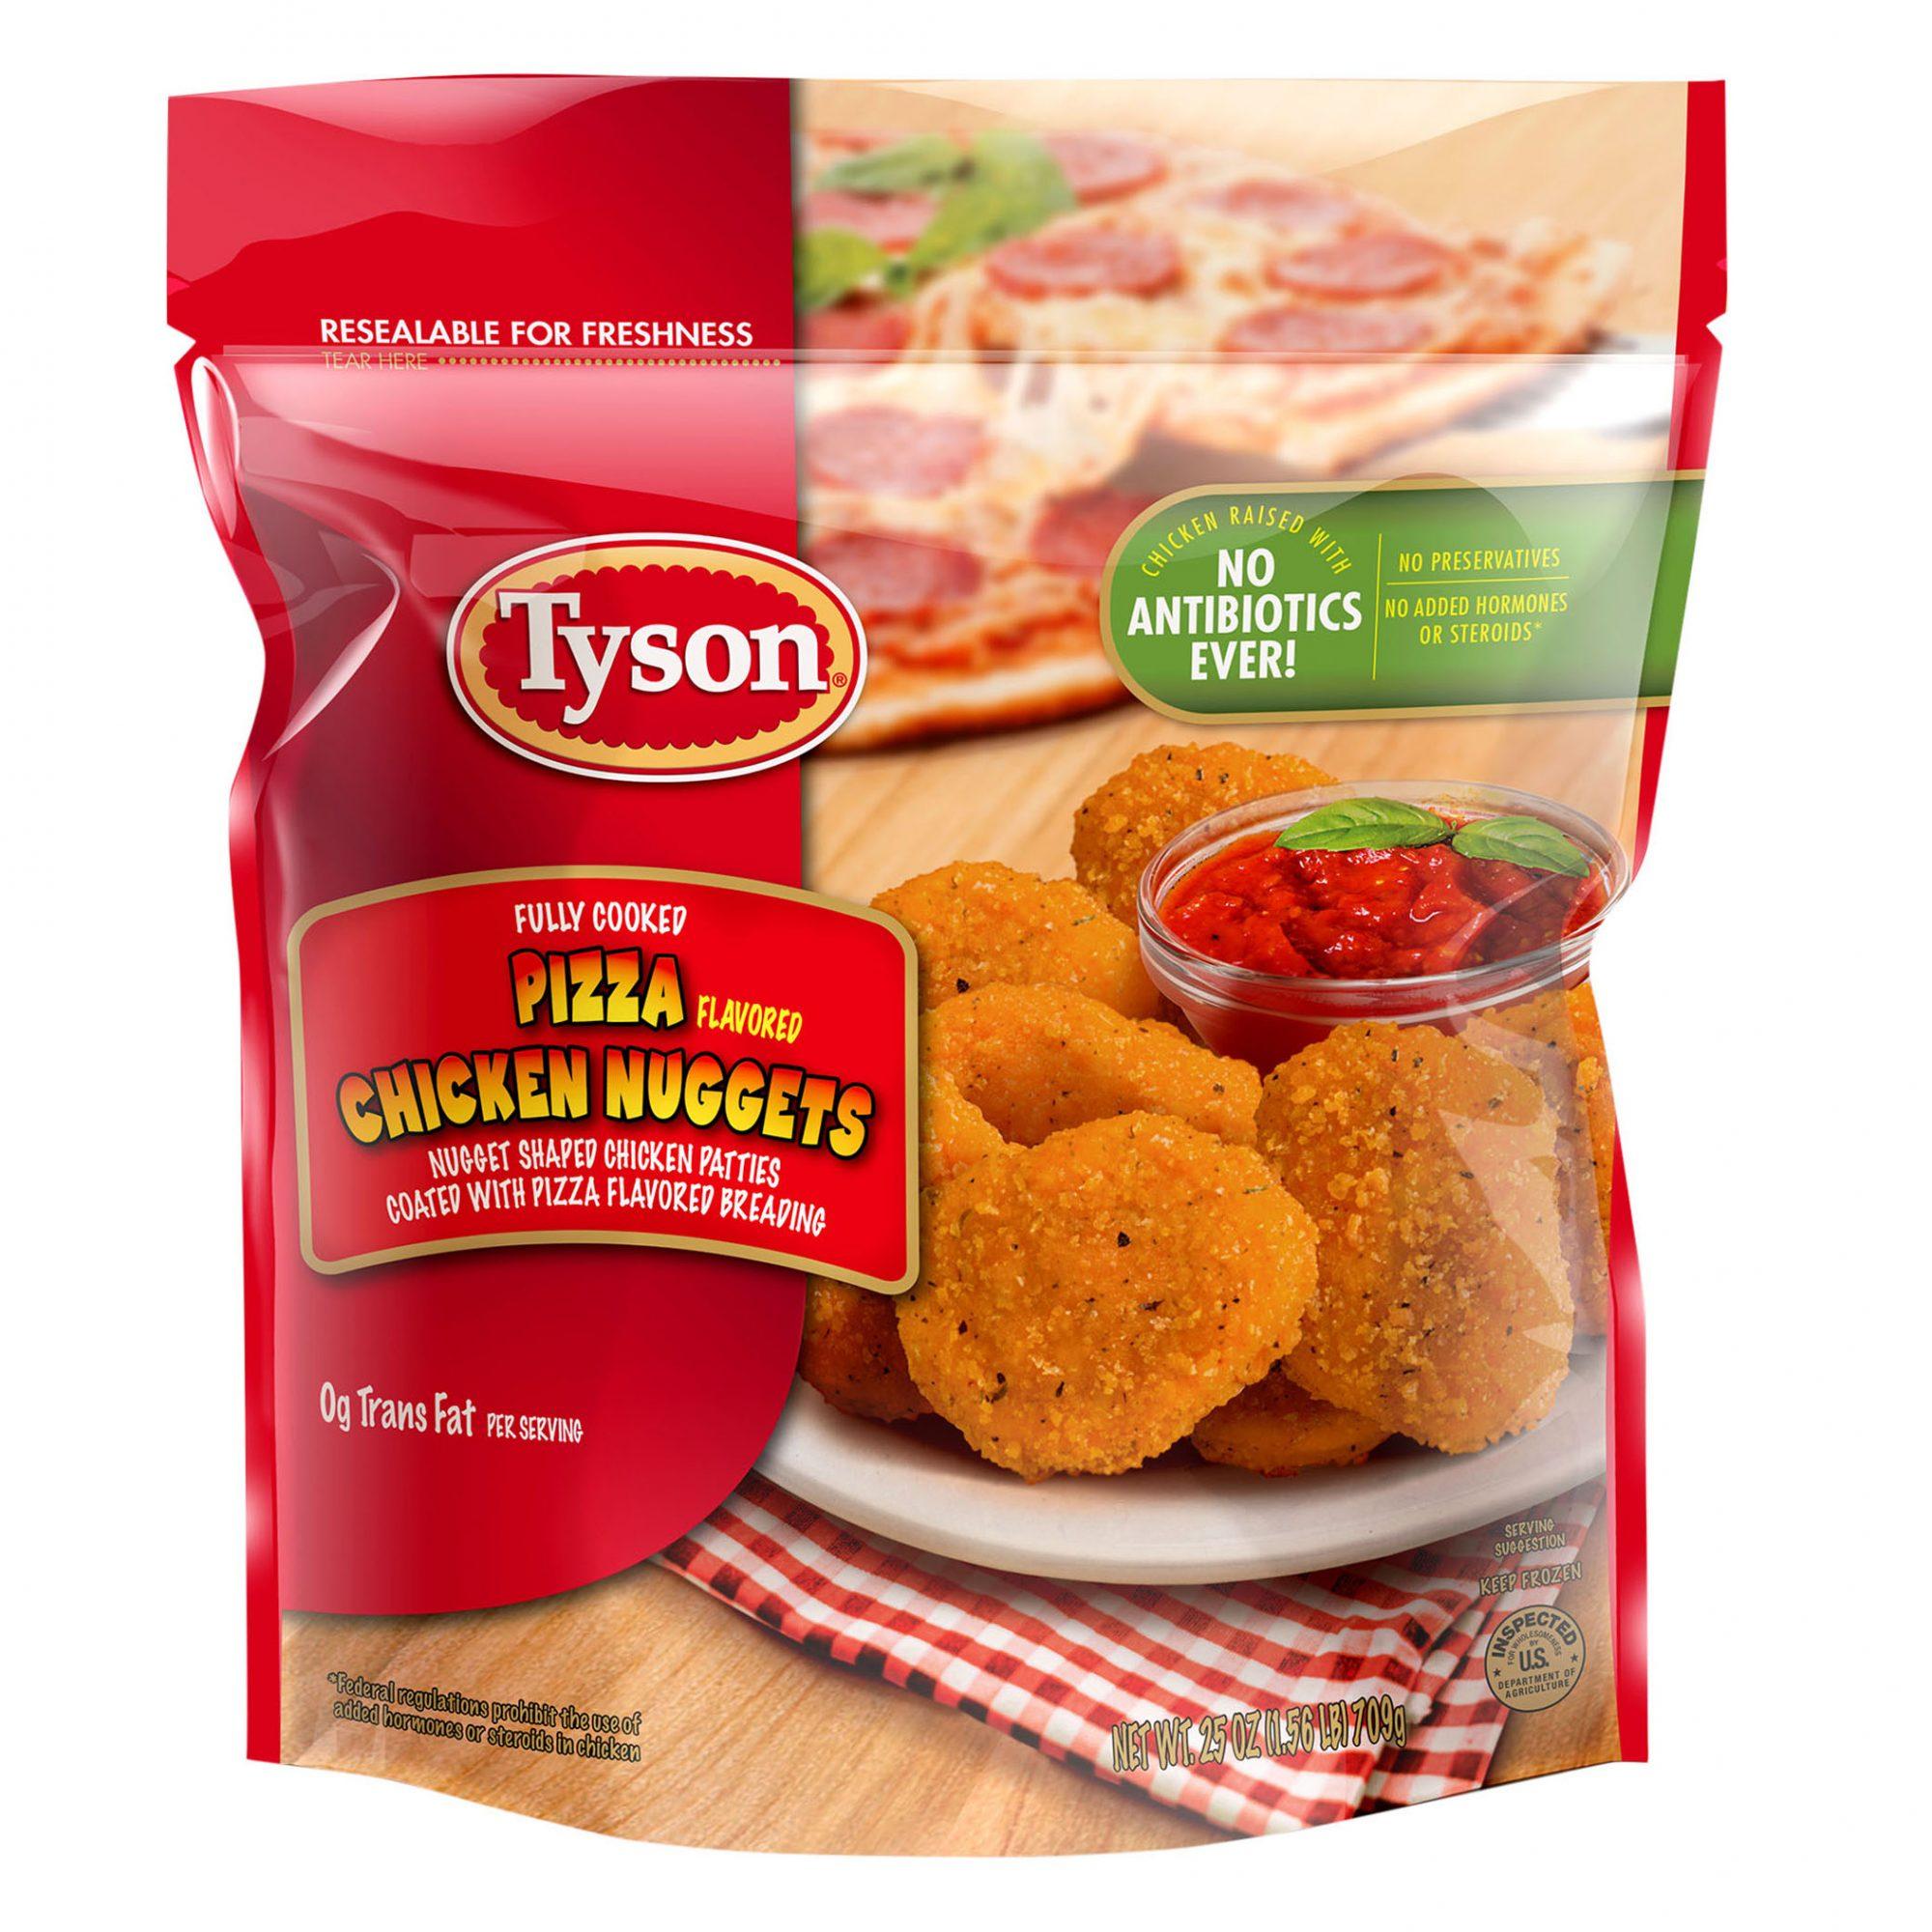 tyson pizza flavored chicken nuggets